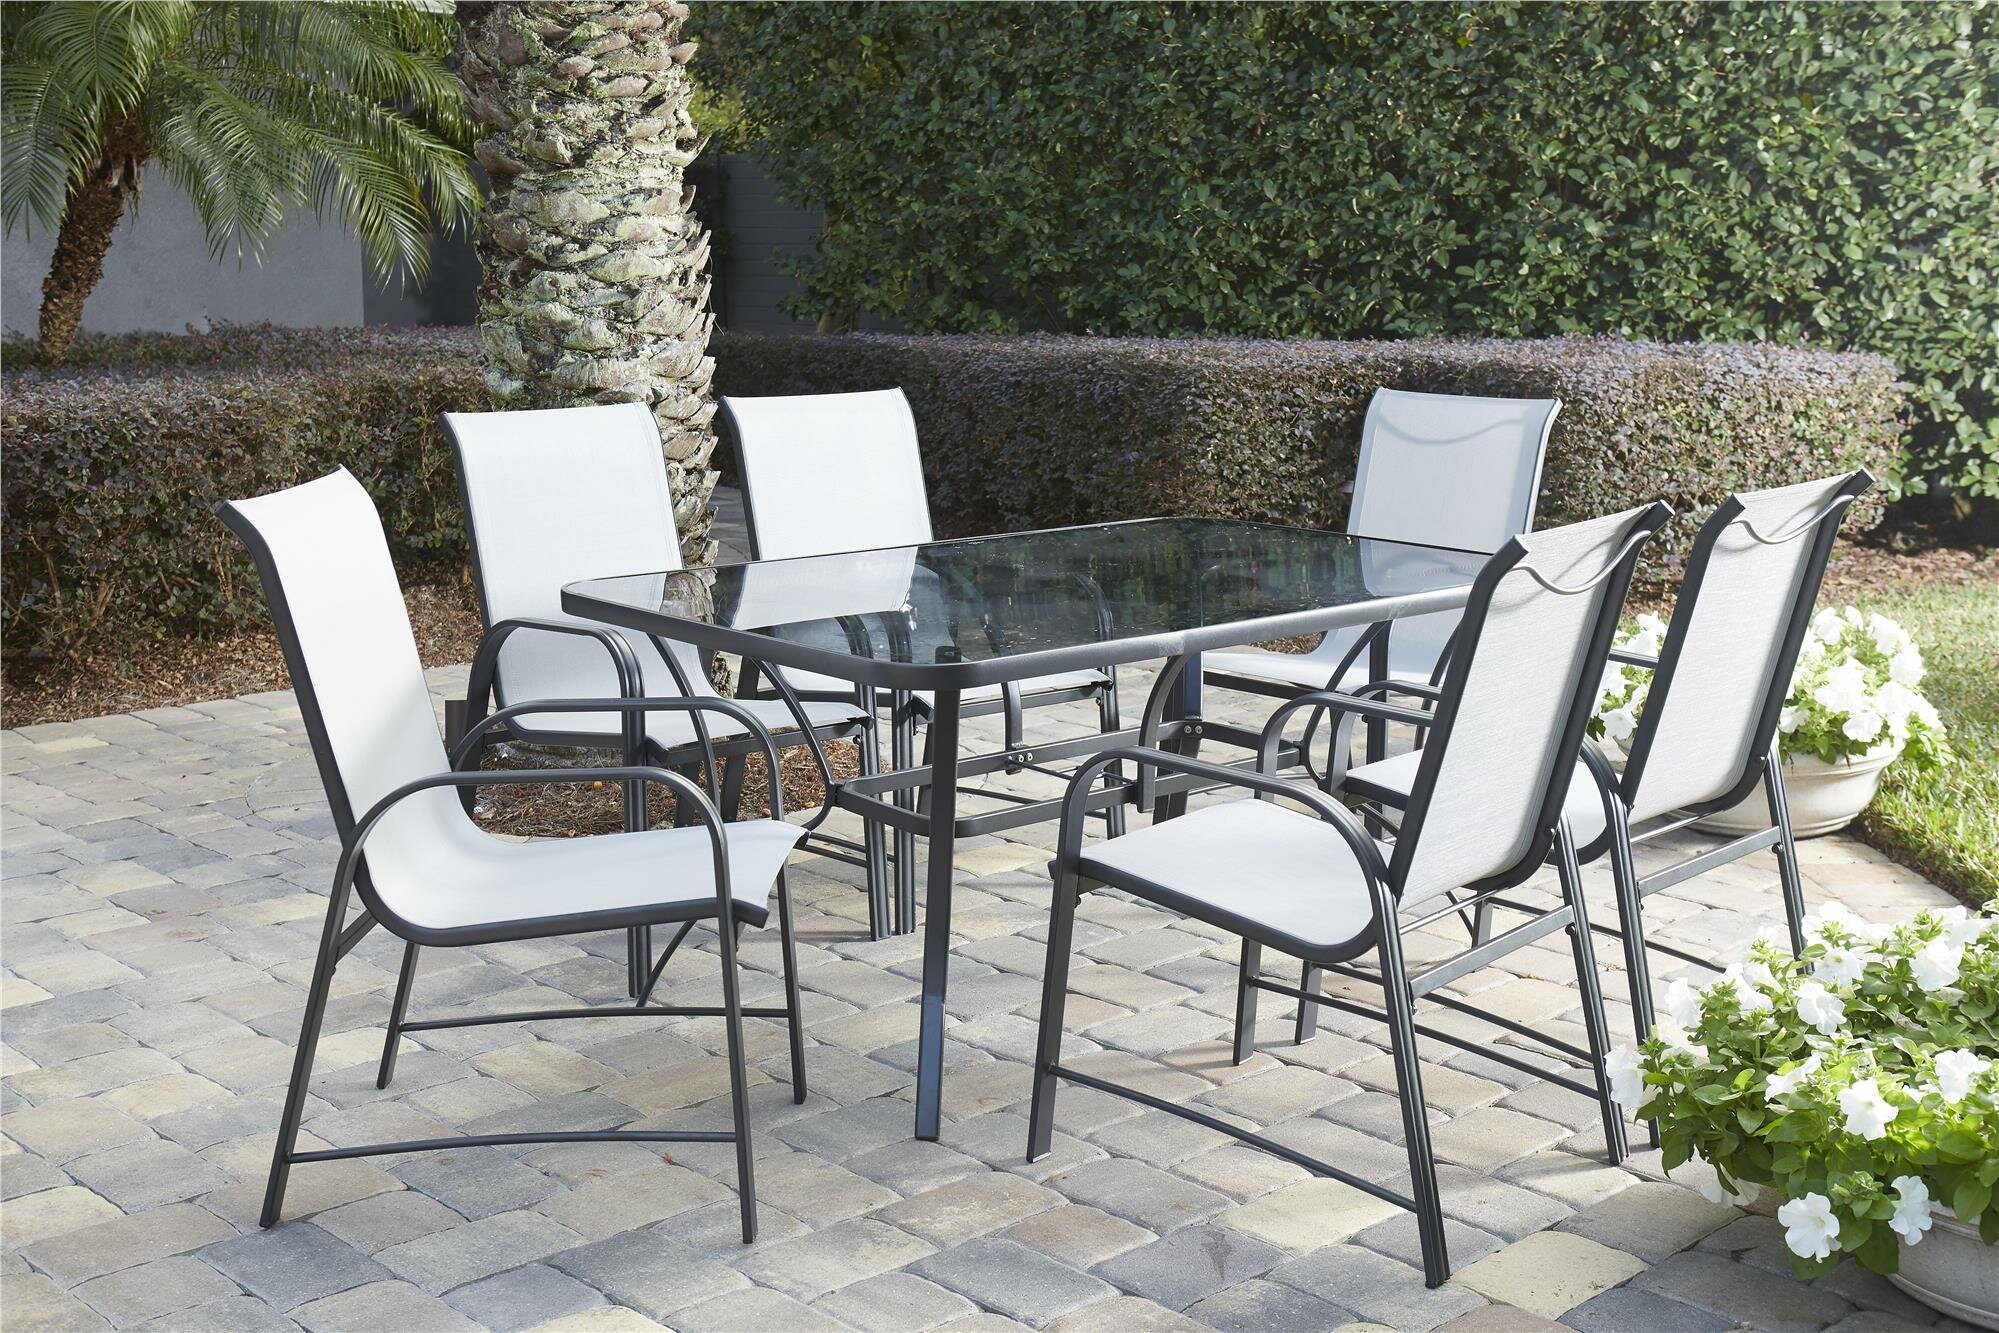 Osprey 7 piece patio dining set